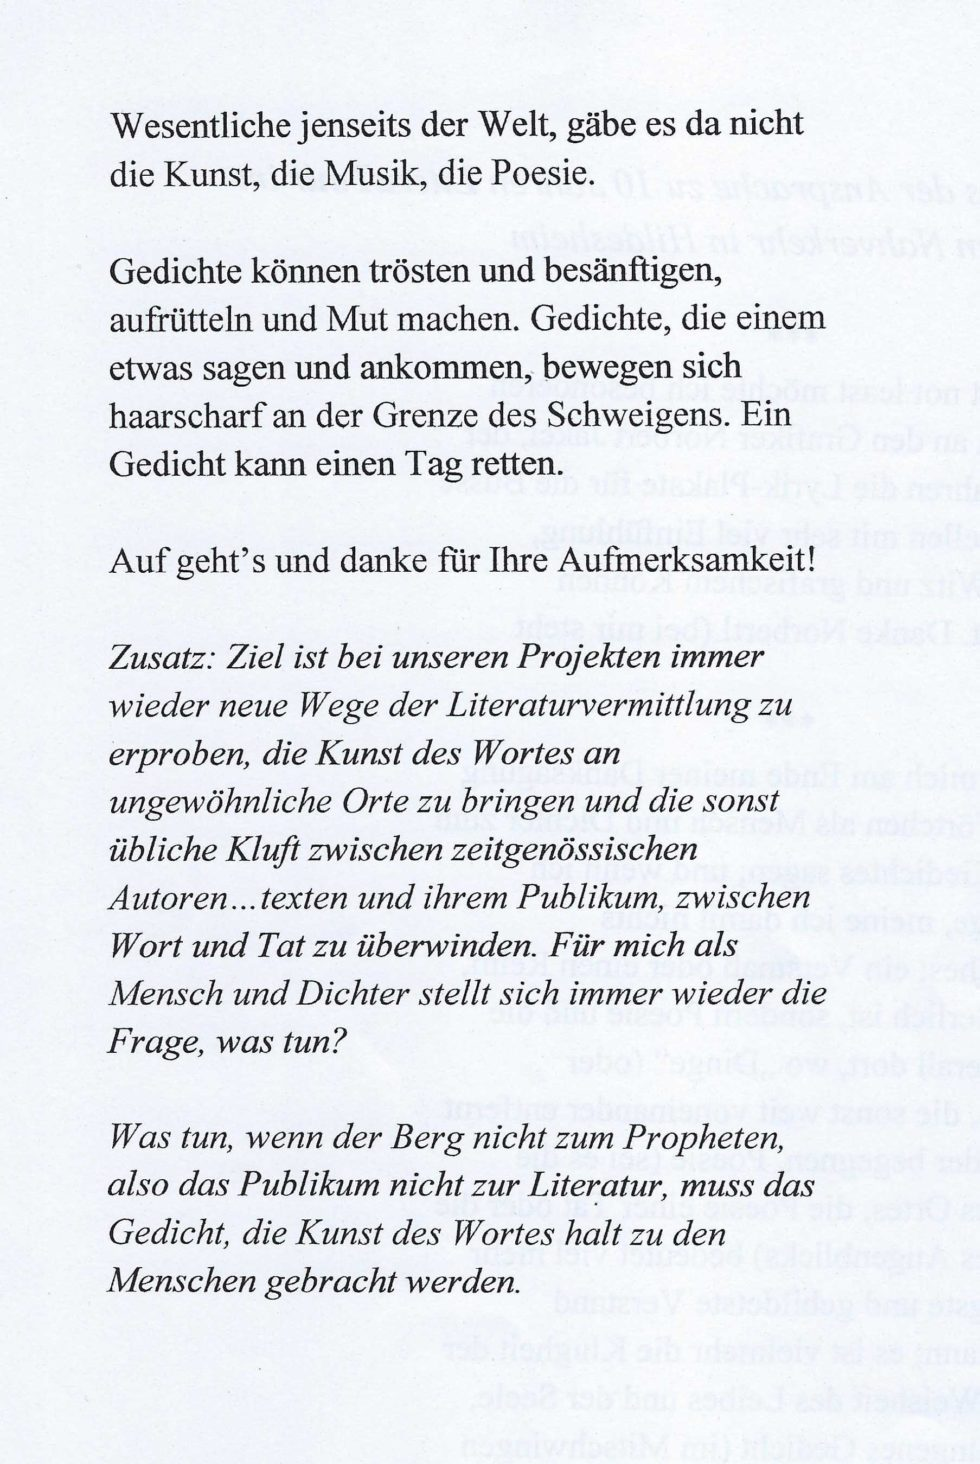 2008_Literatour_11